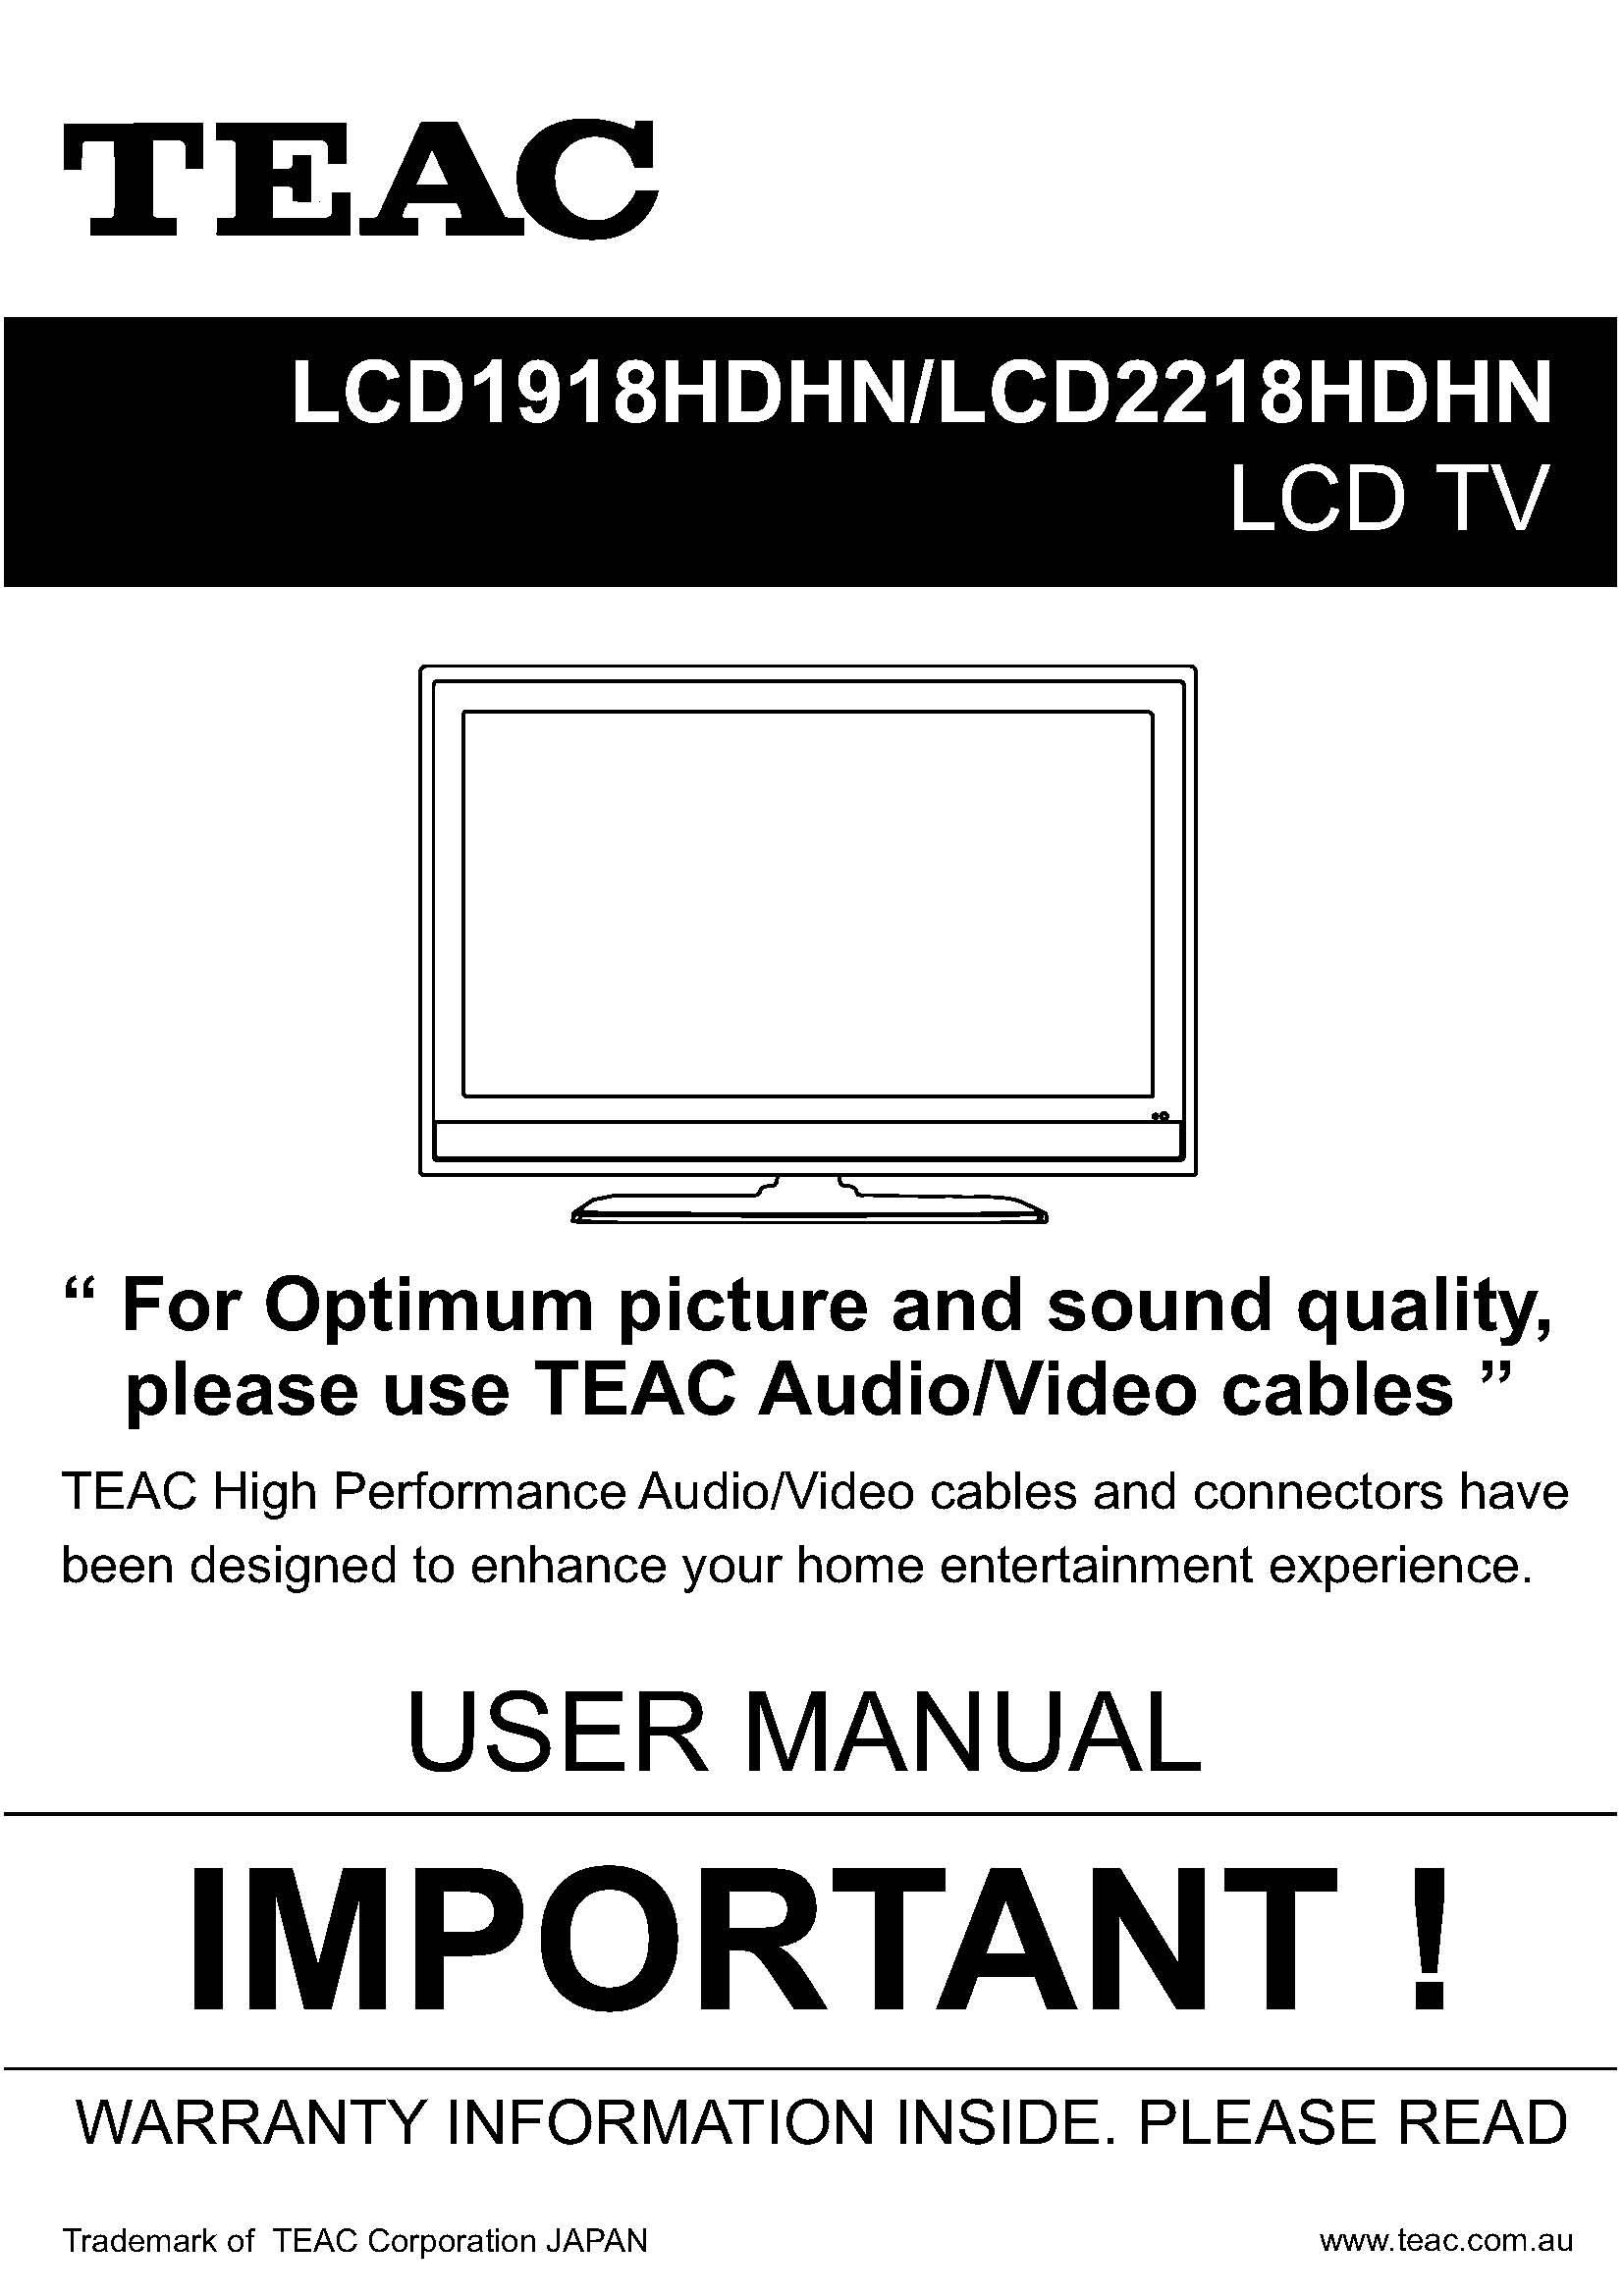 TEAC LCD19-2218HDHN User Manual